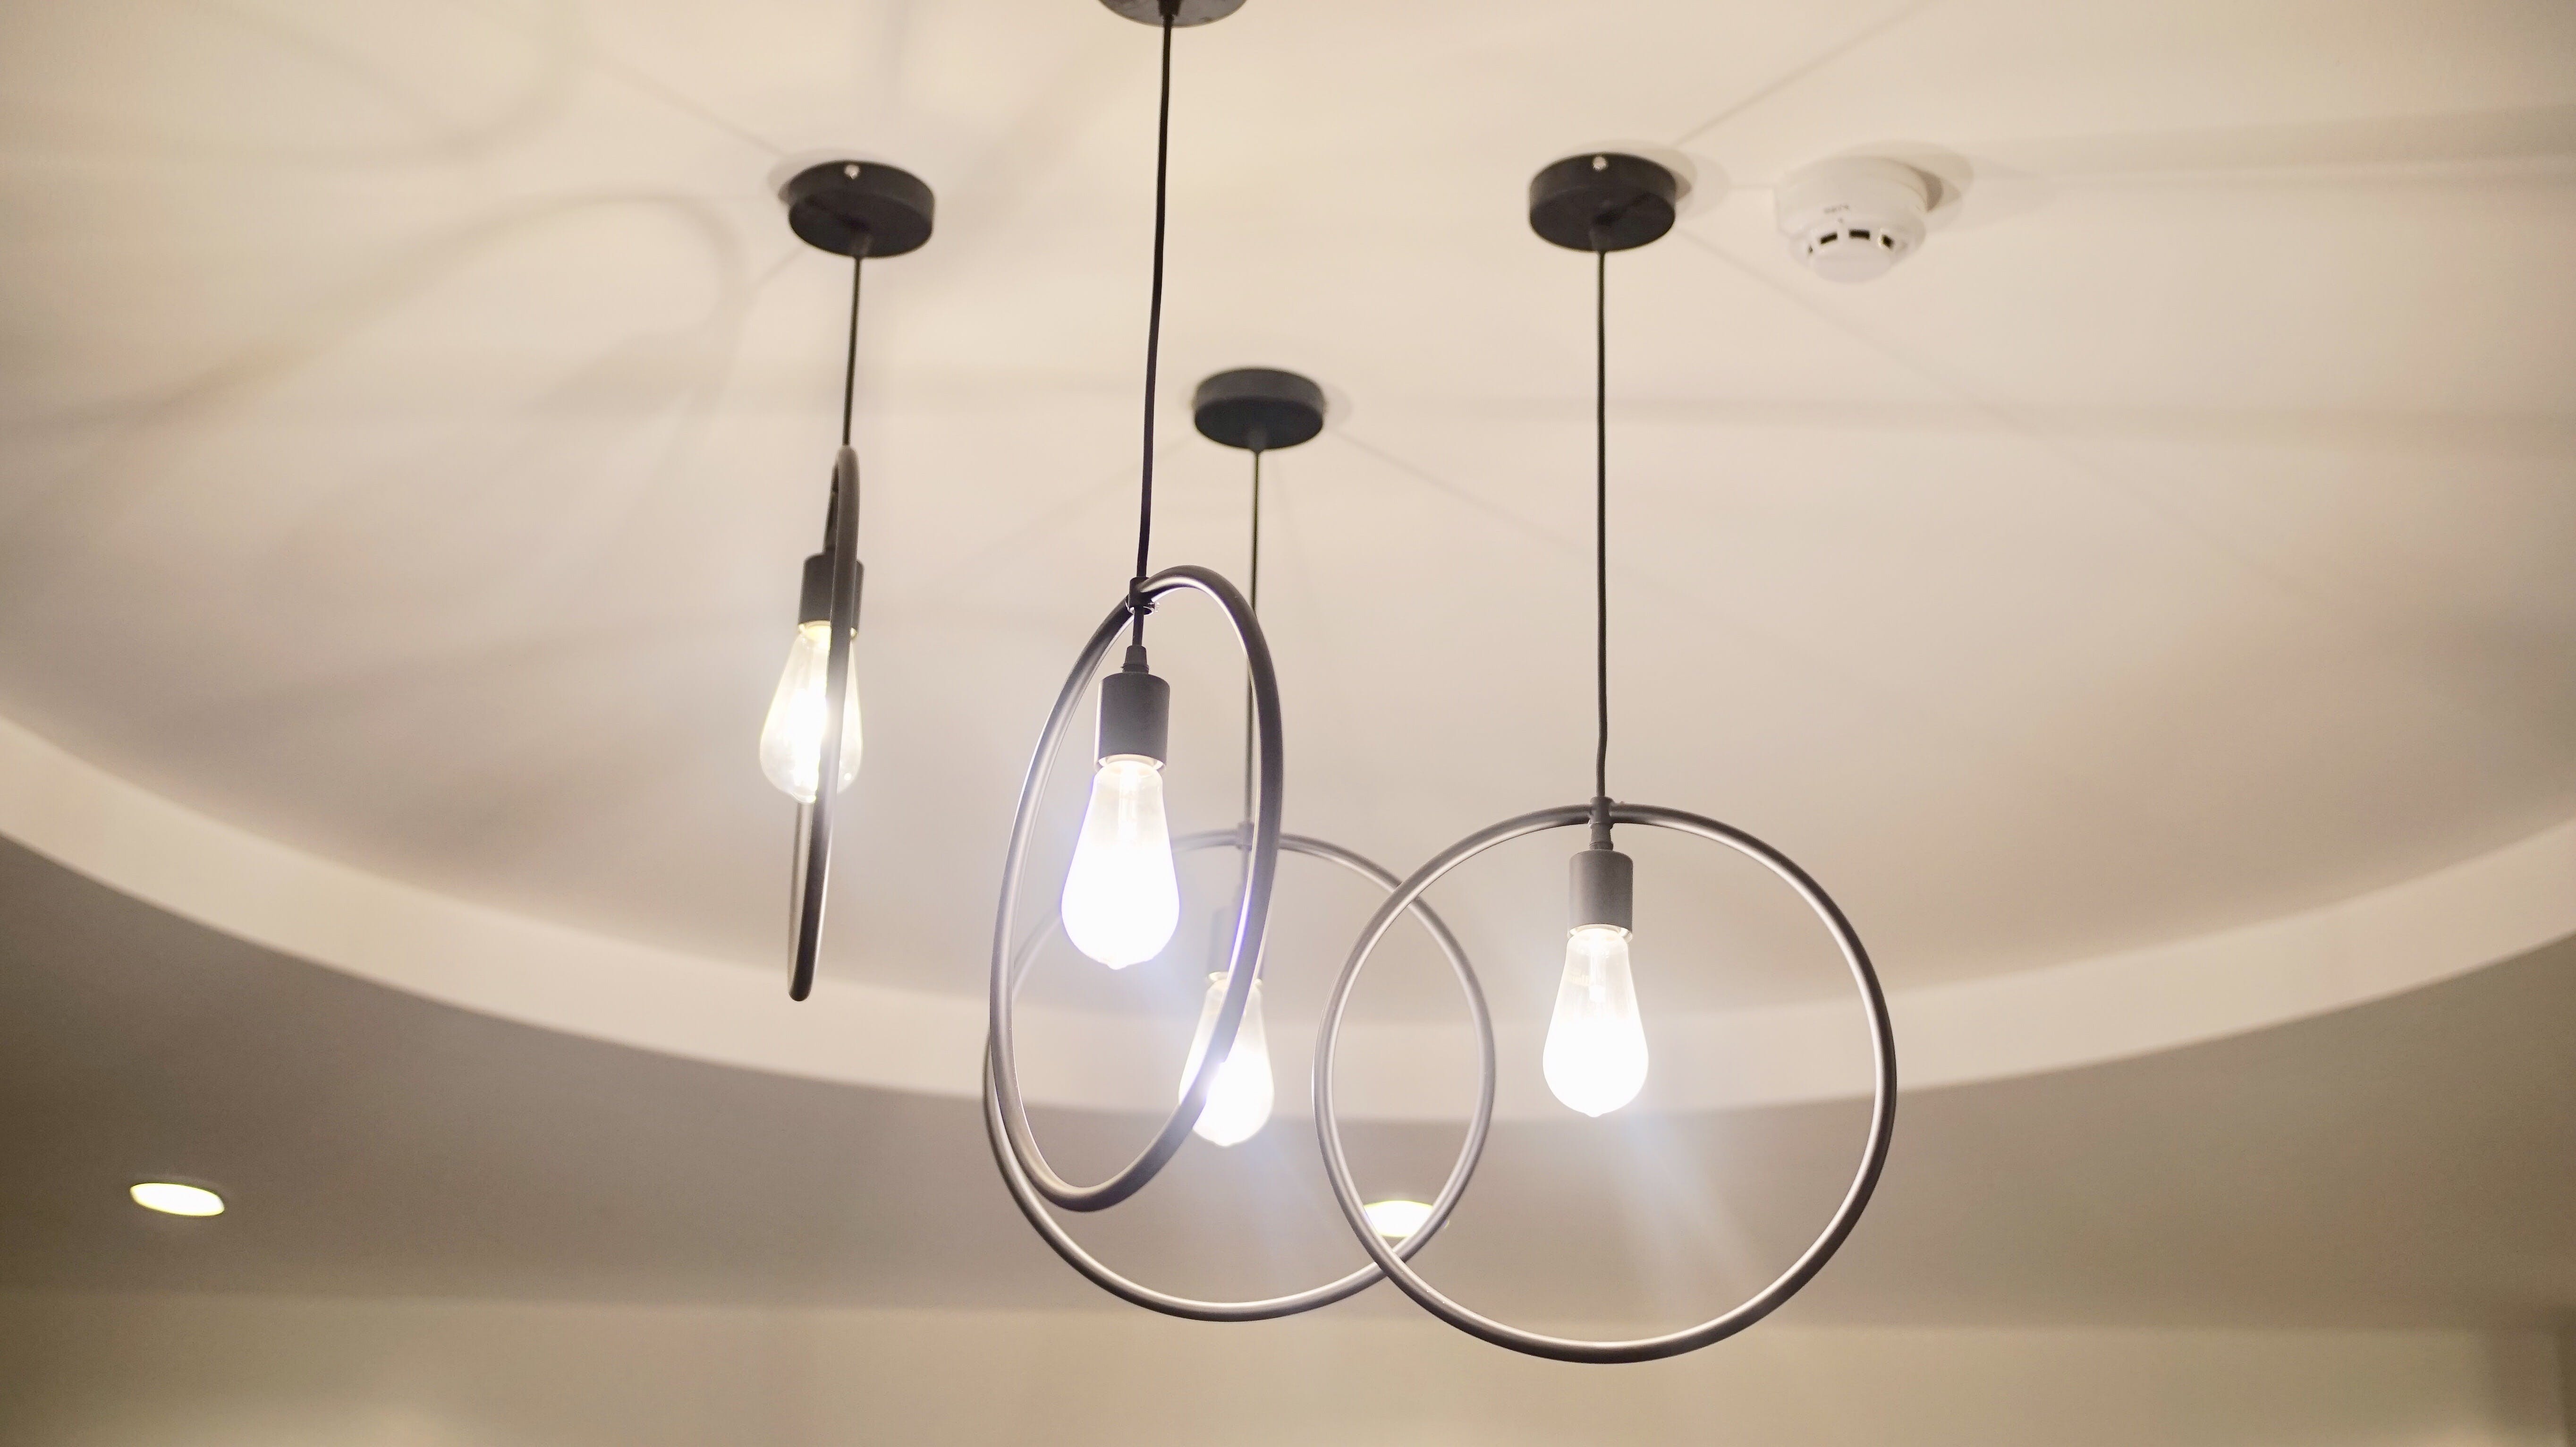 Free stock photo of ceiling lights, Drop Lamp, Pendant Light